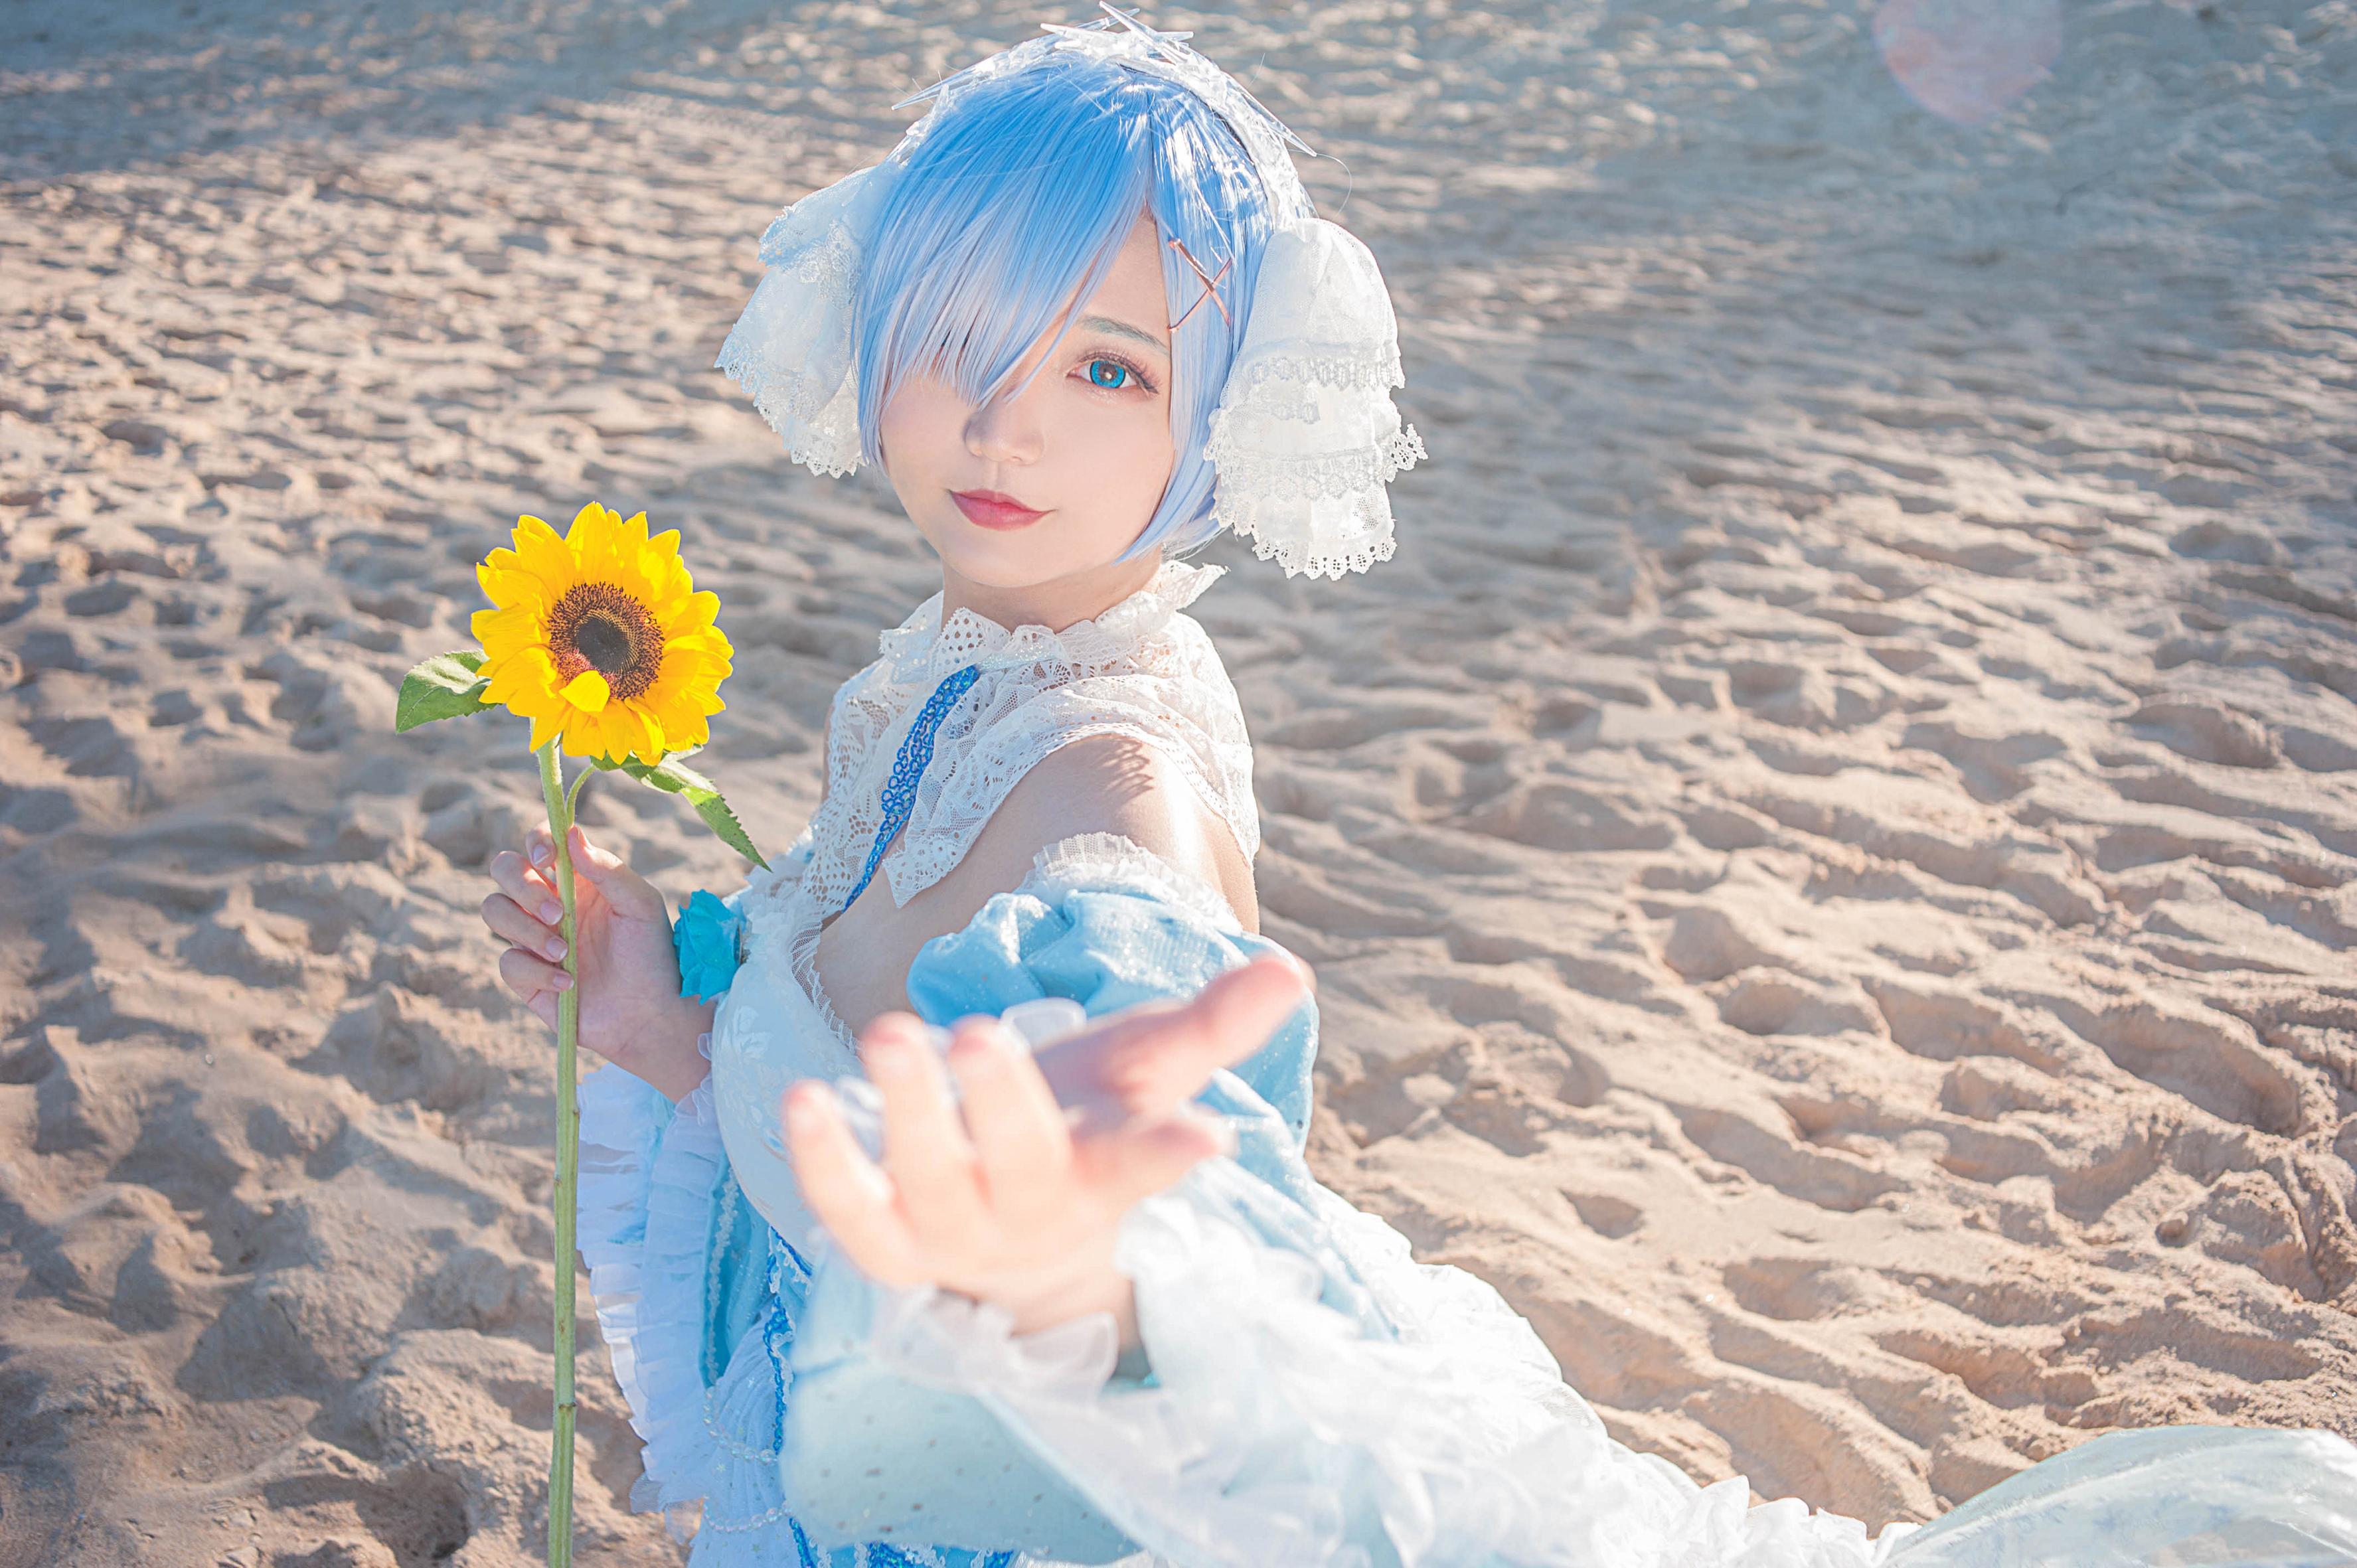 《RE:从零开始的异世界生活》从零开始的异世界生活蕾姆cosplay【CN:Kyuu_九笛】-第7张